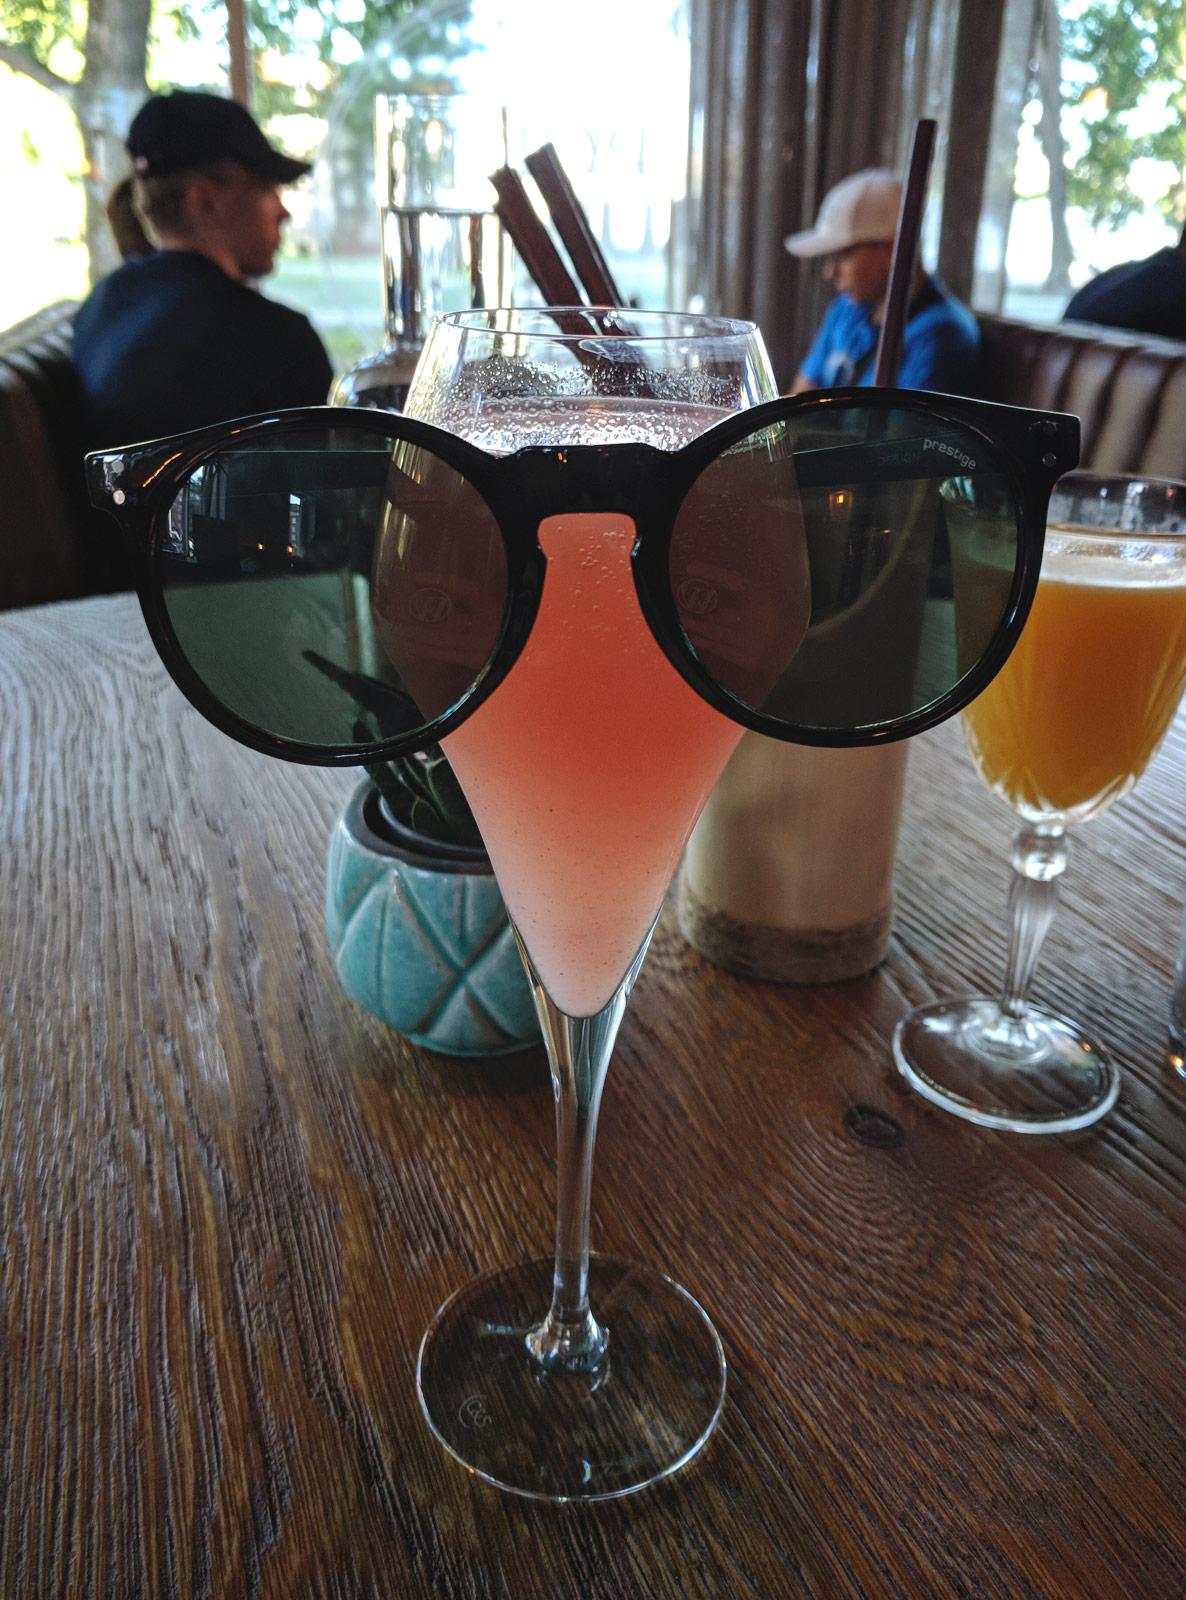 Sunglasses on peach bellini